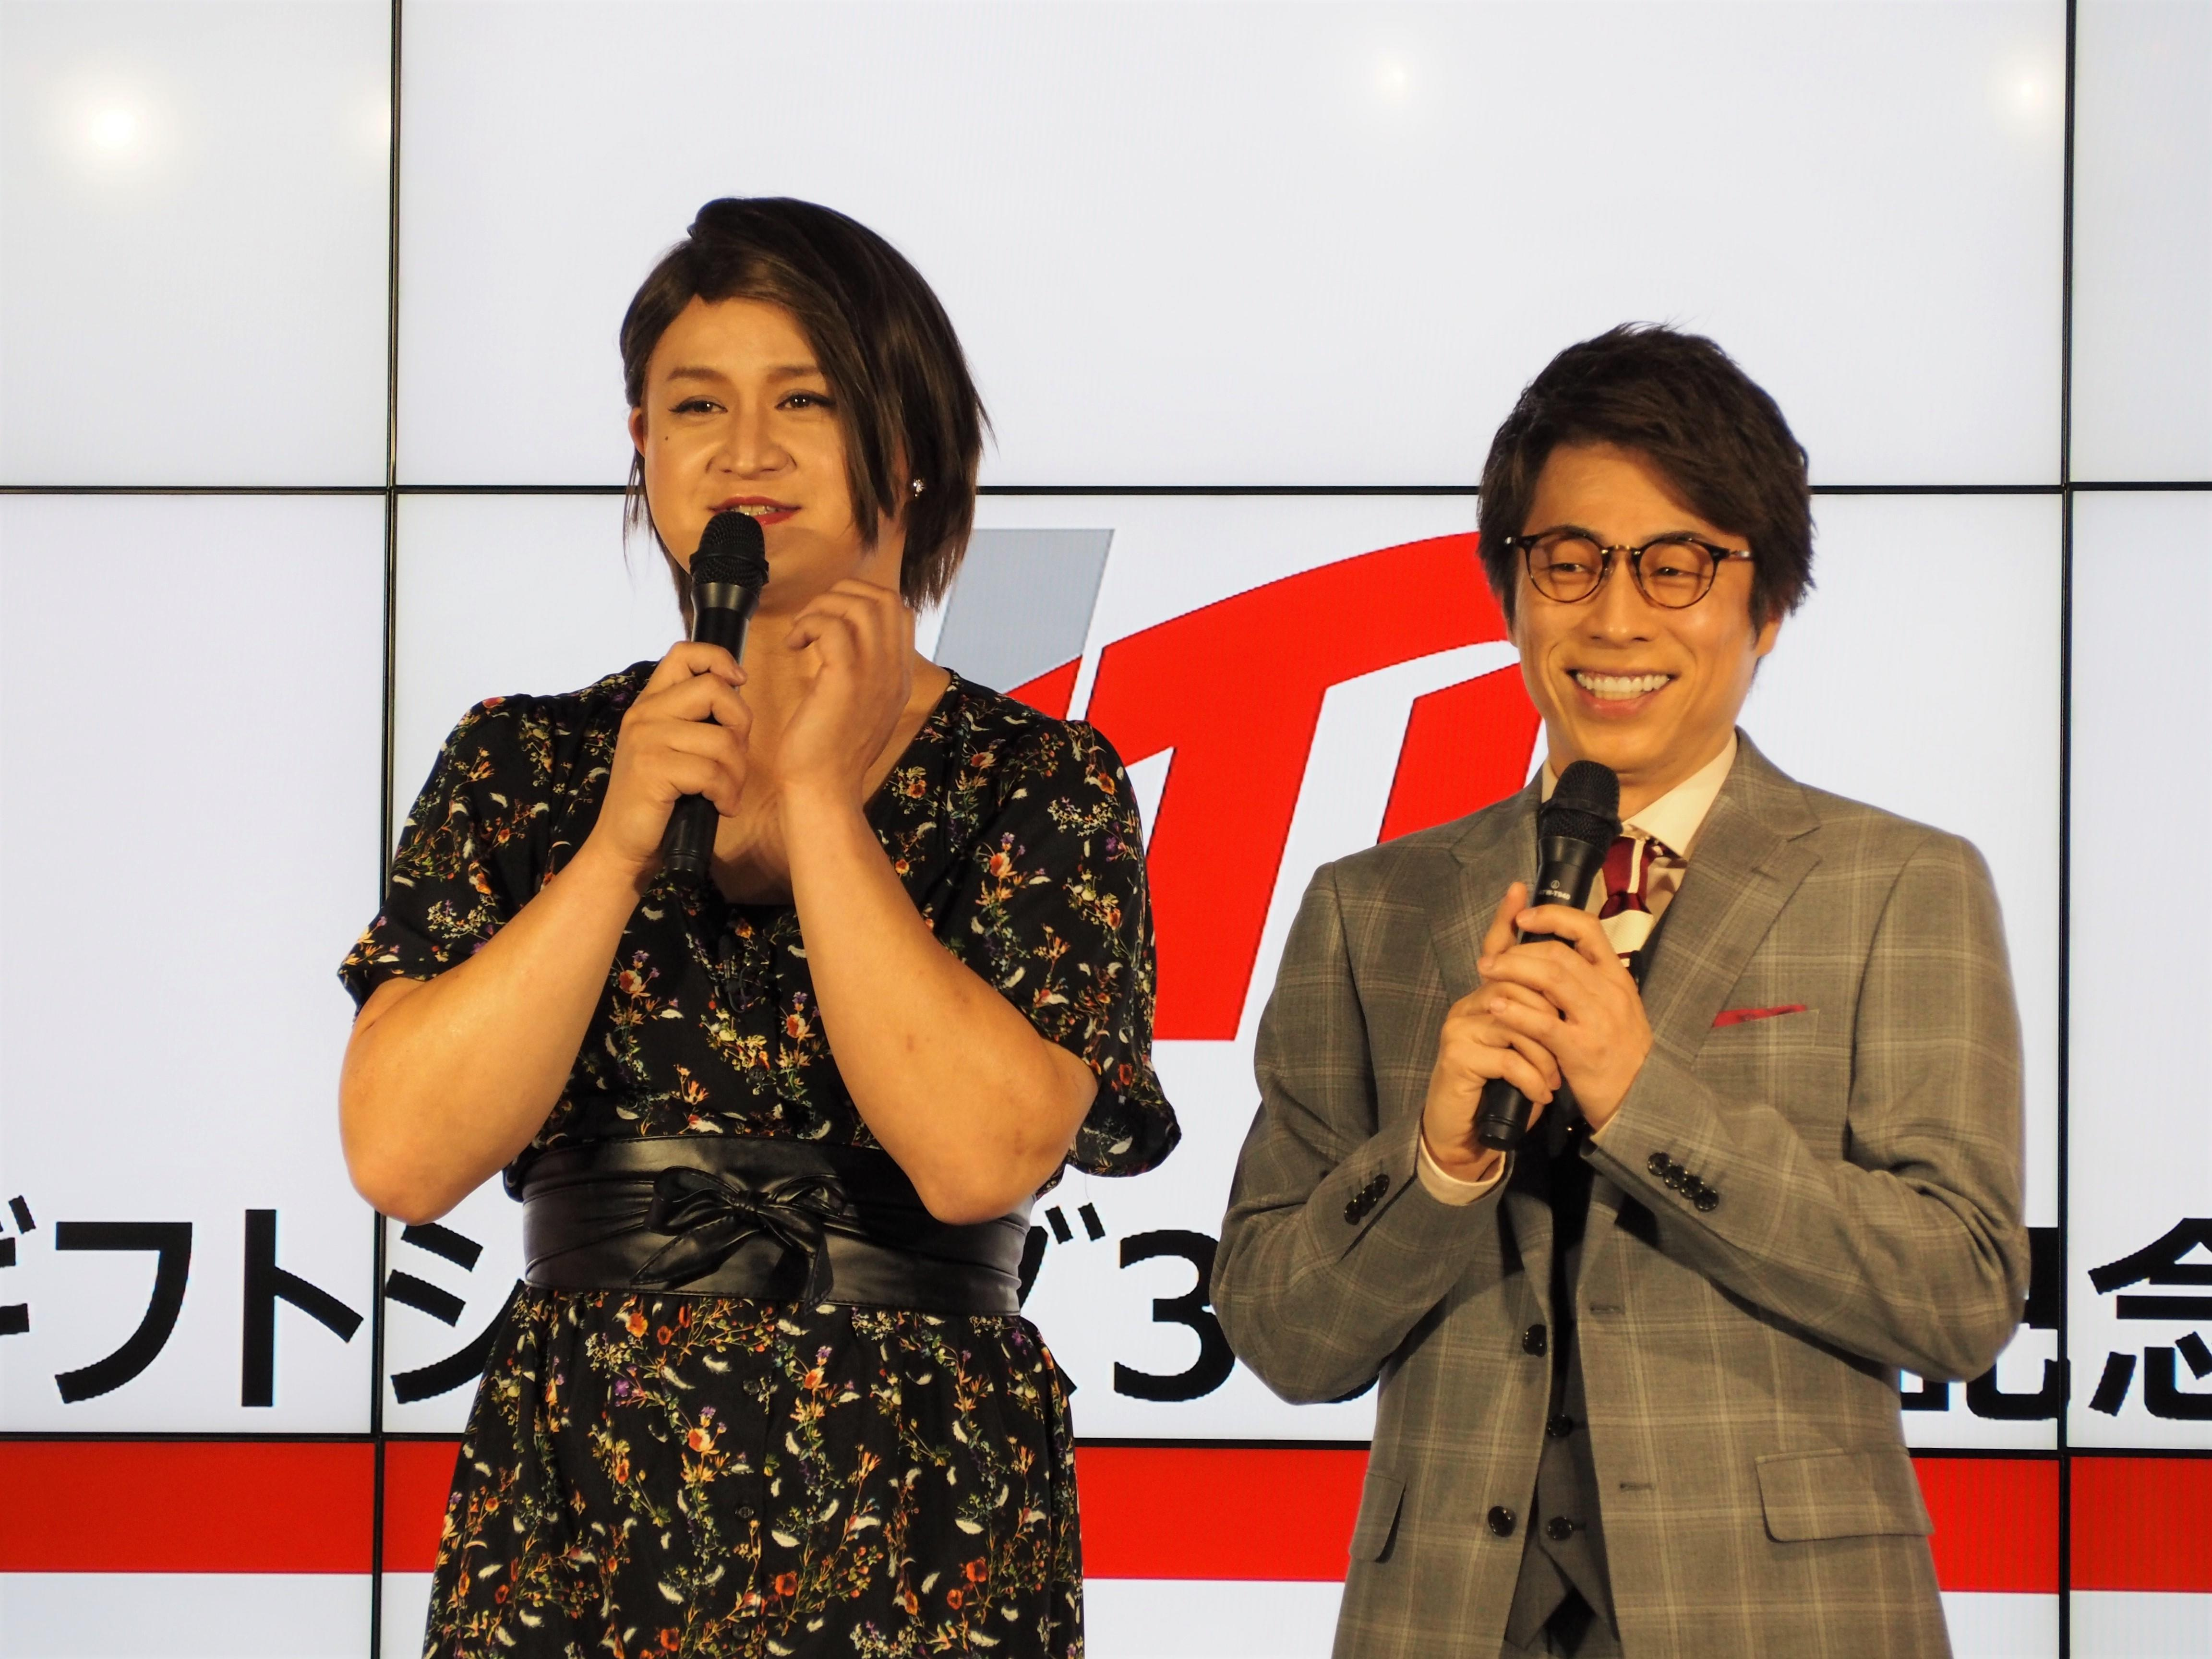 http://news.yoshimoto.co.jp/20180330121658-2ae36cb620b711c048bdf51351394ca8a5f5e85c.jpg